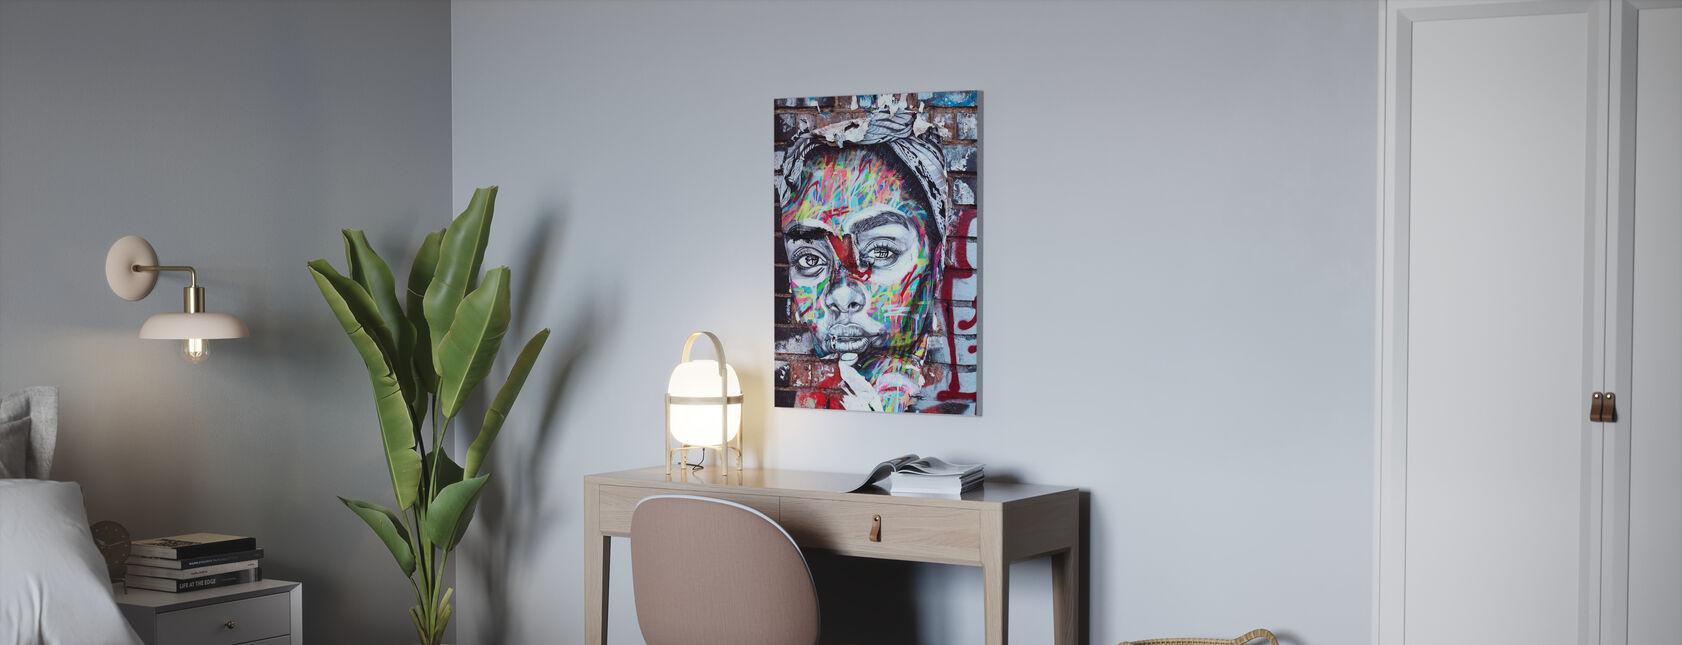 Street Art Porträt - Leinwandbild - Büro